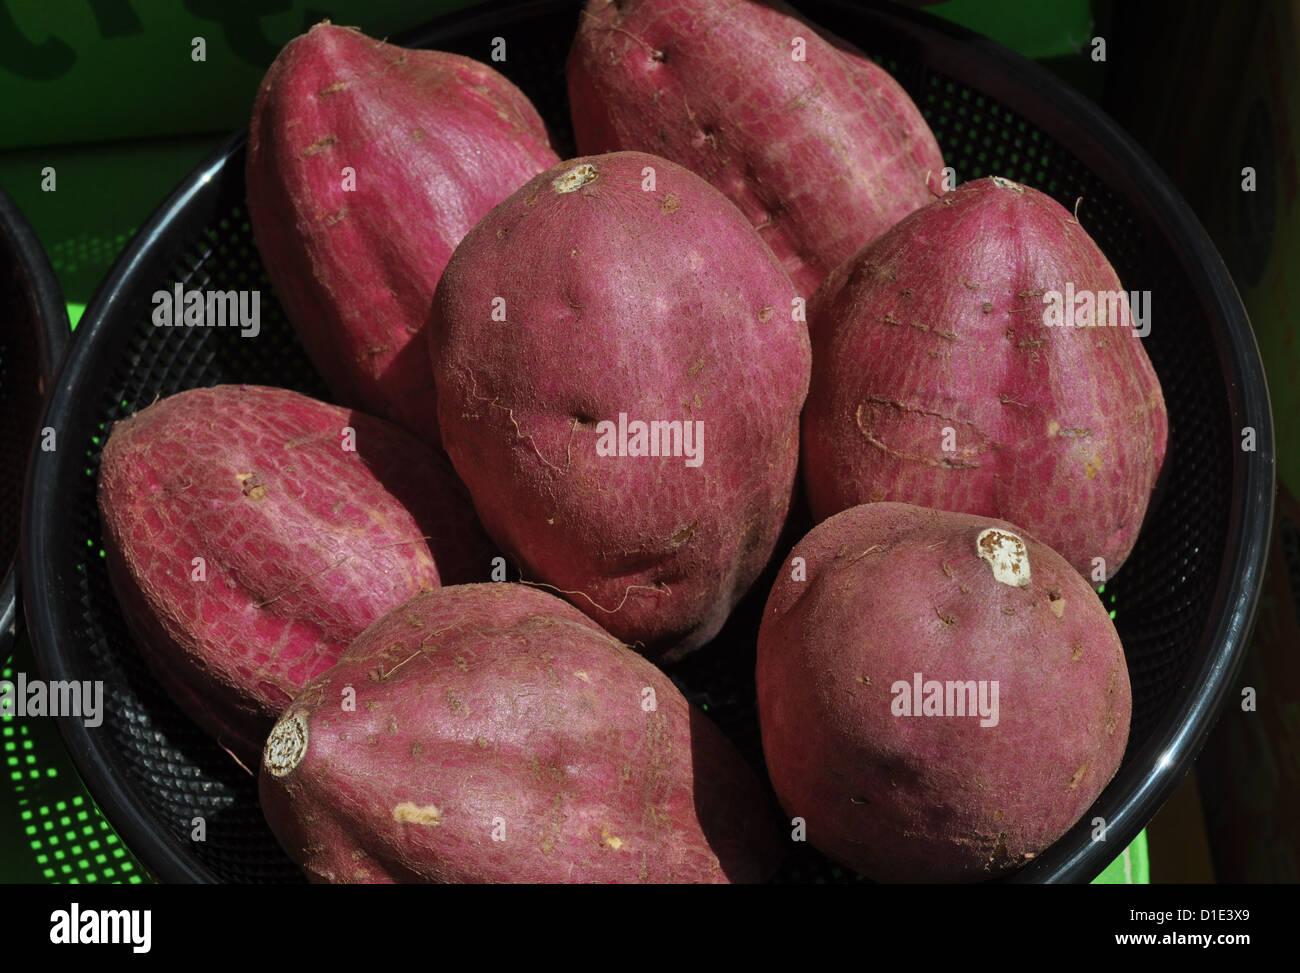 Naha (Okinawa, Japan), sweet potatoes - Stock Image